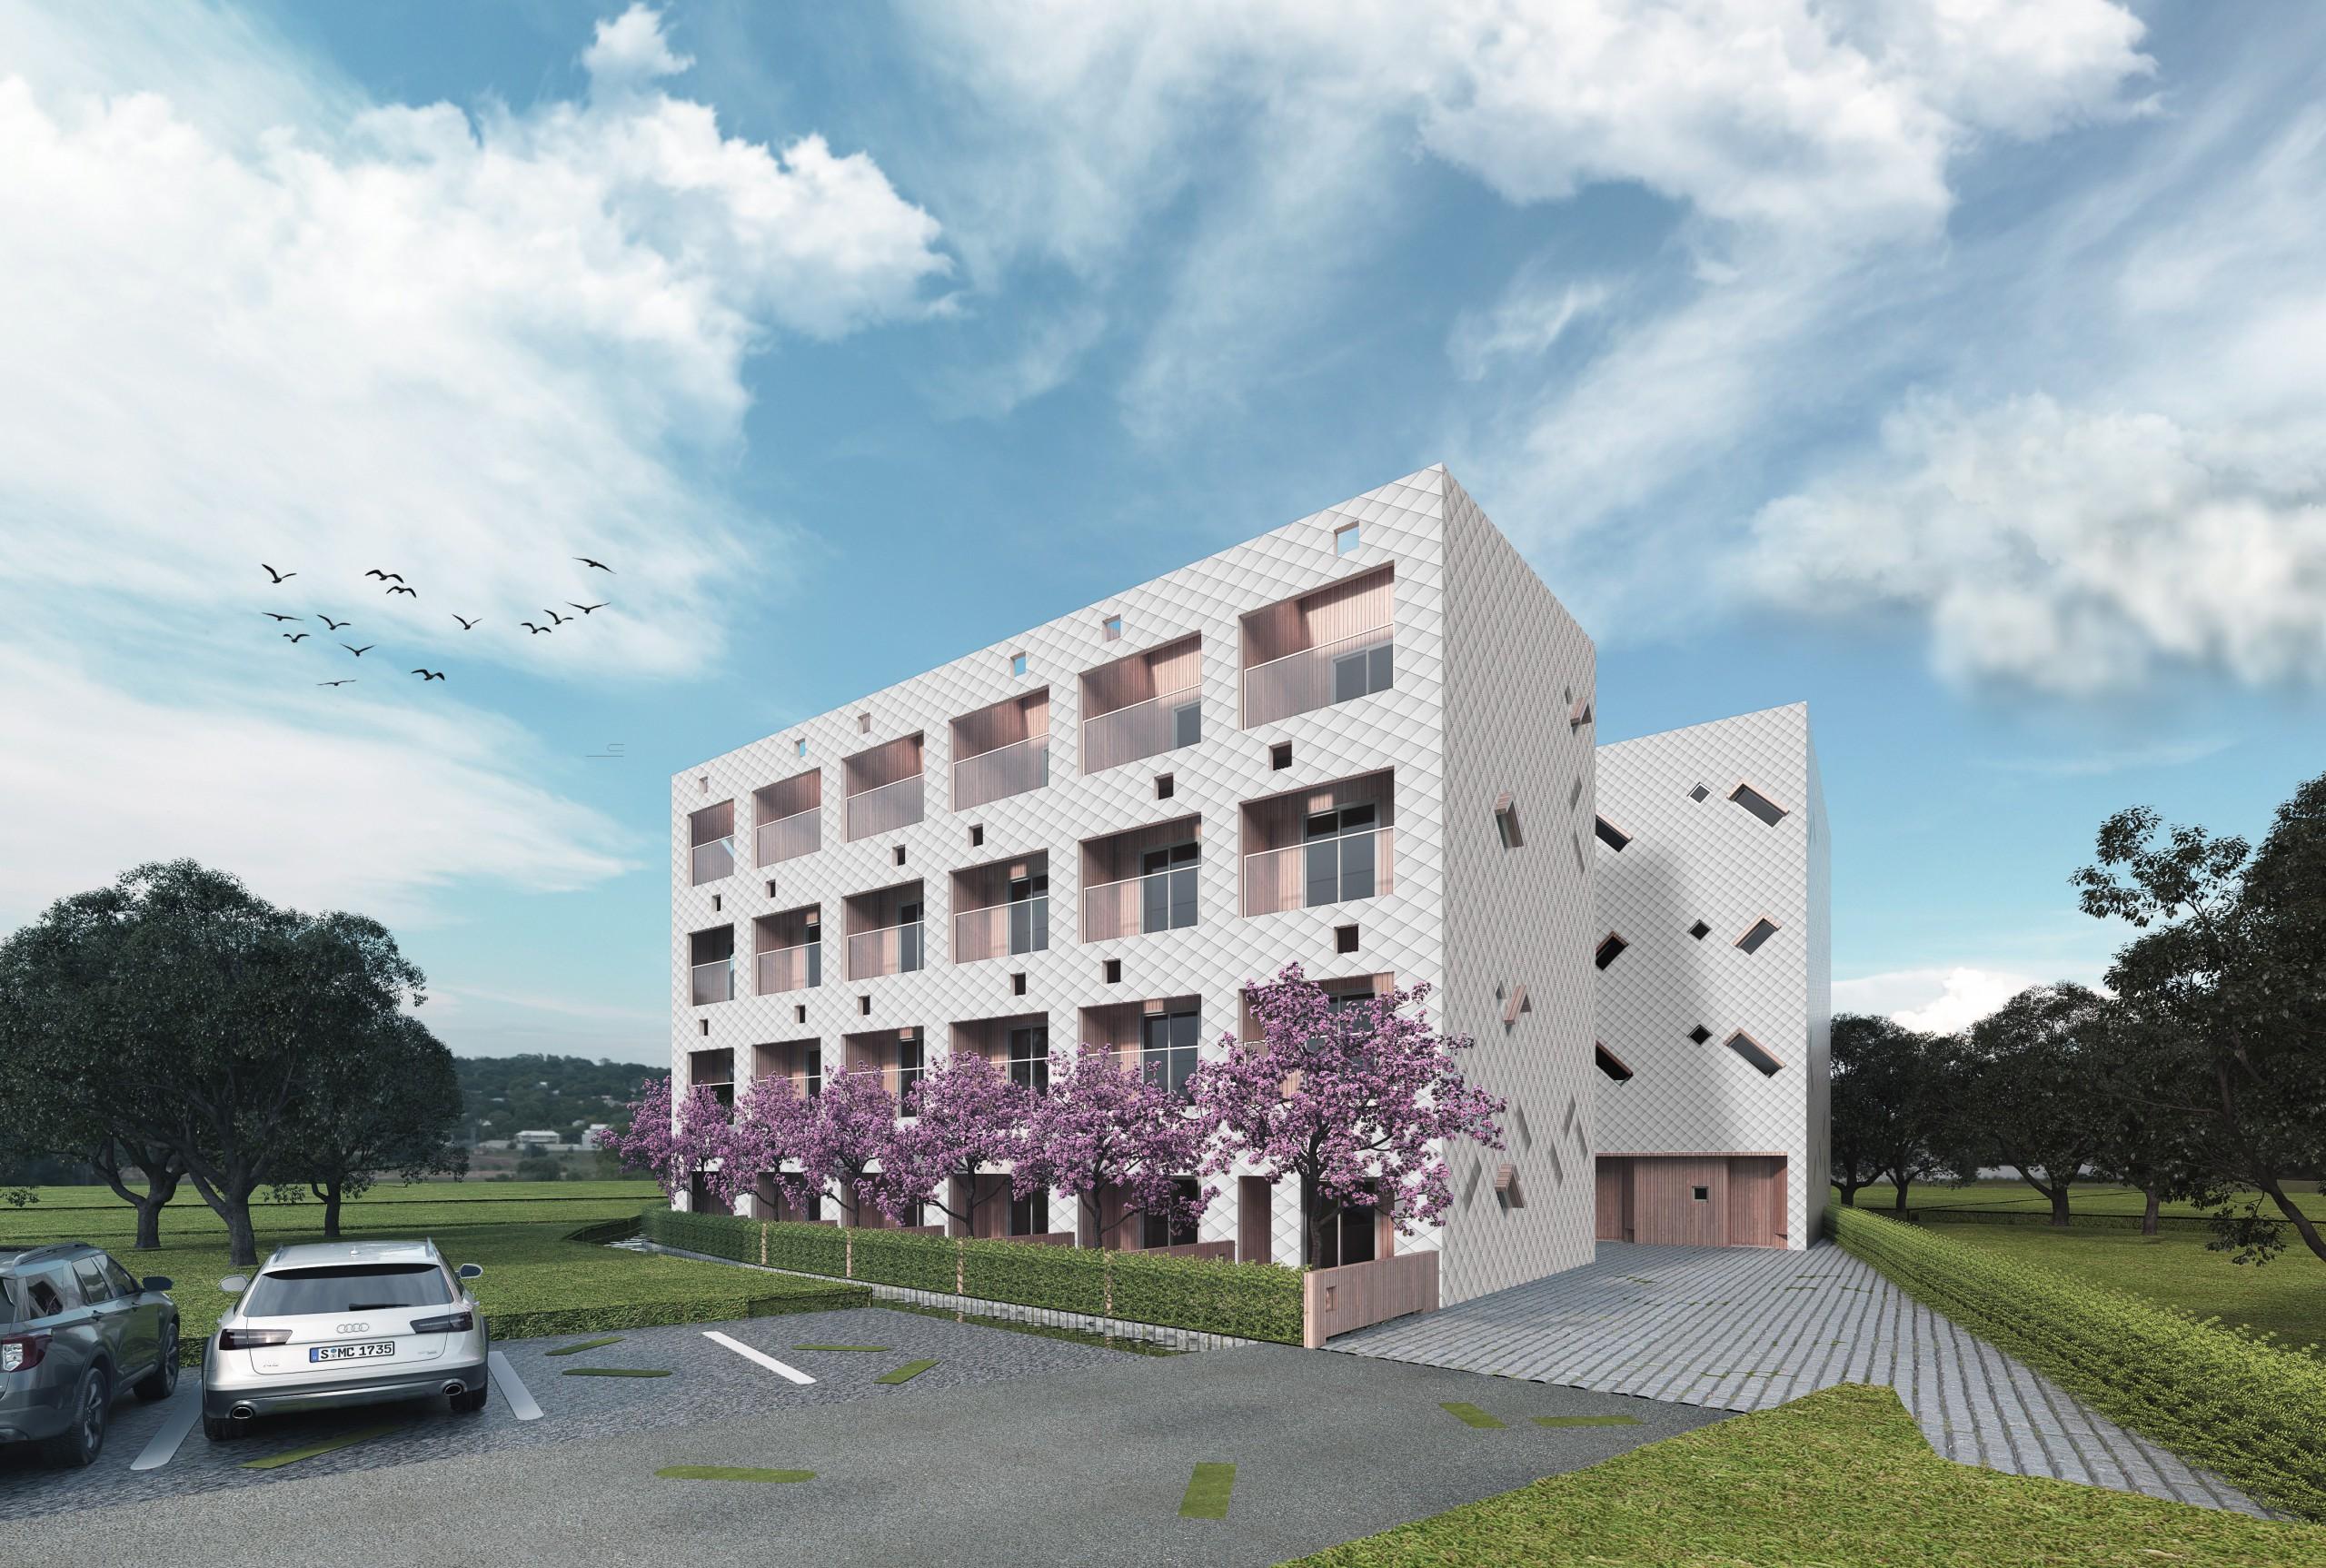 德築-DEZU-project-Zuyin-architecture-building-3Drendering-1